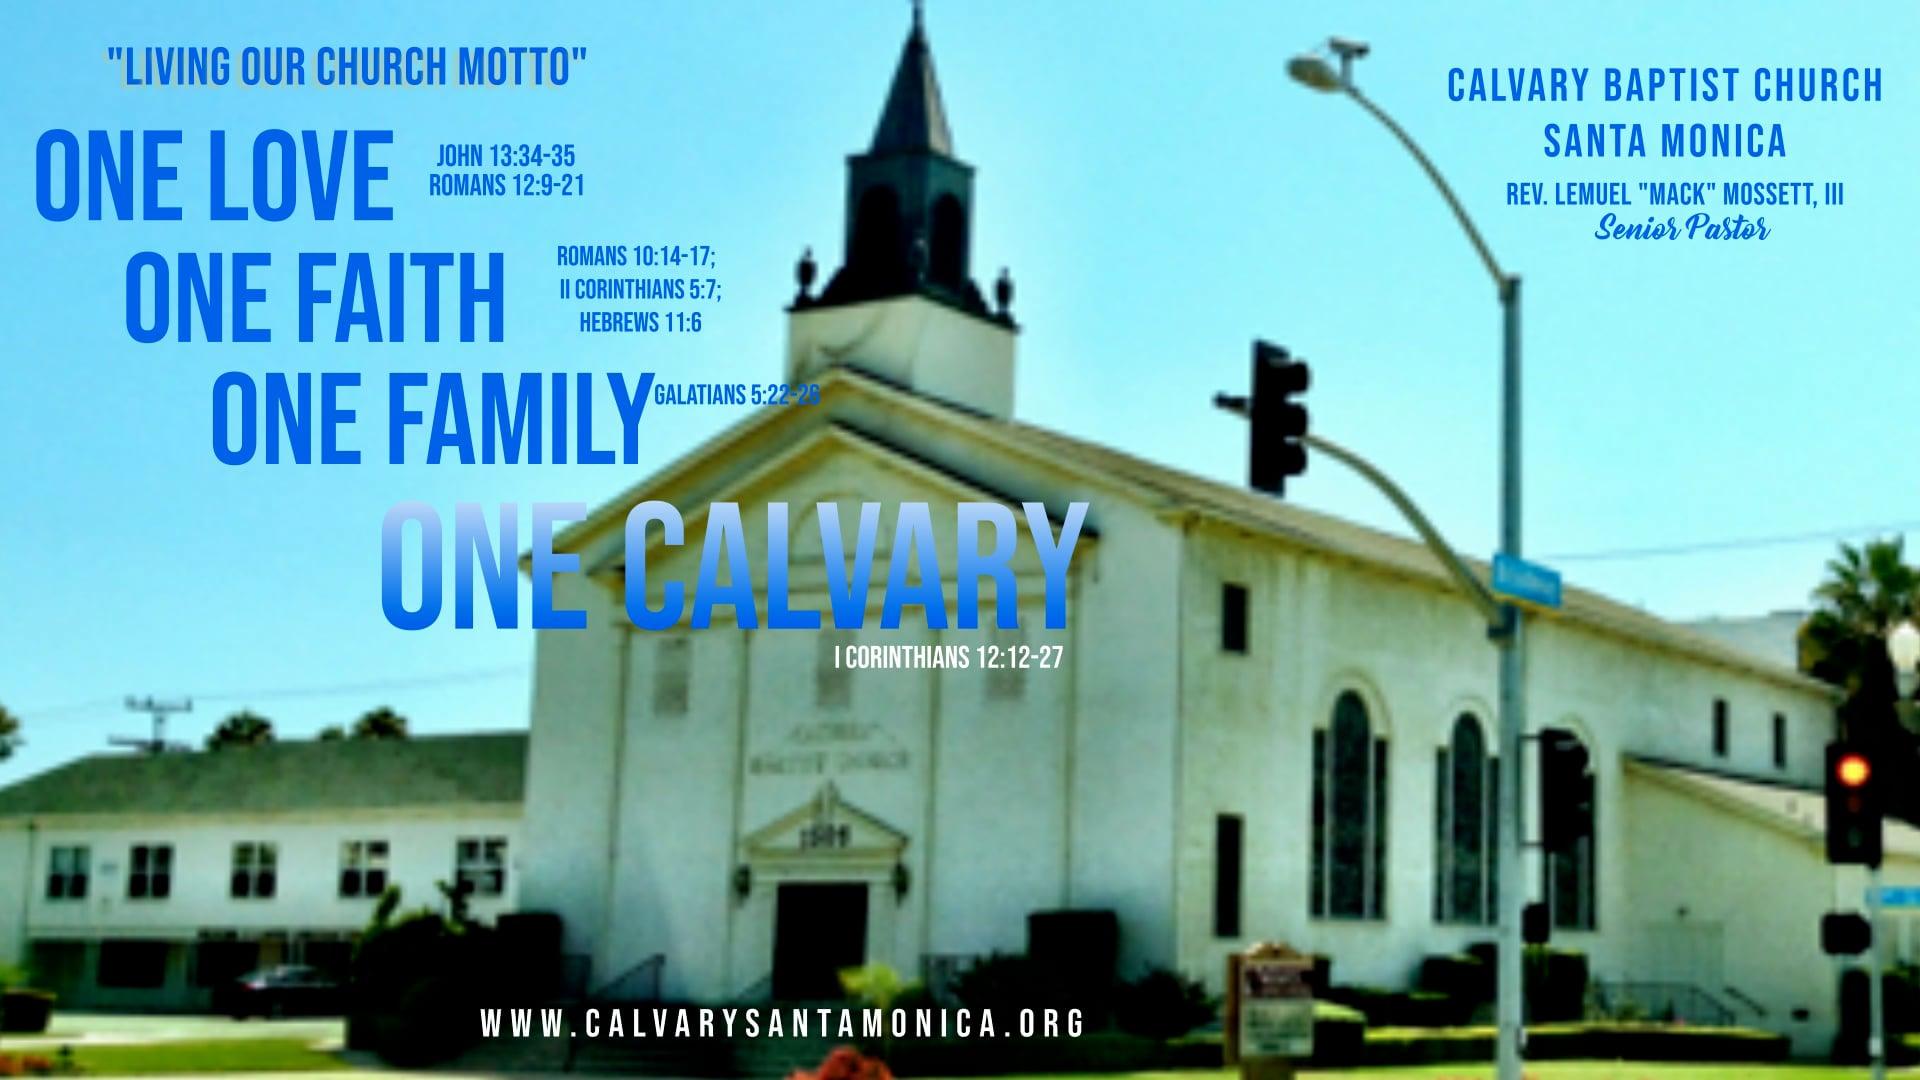 09.26.21 Calvary Baptist Church Worship Service